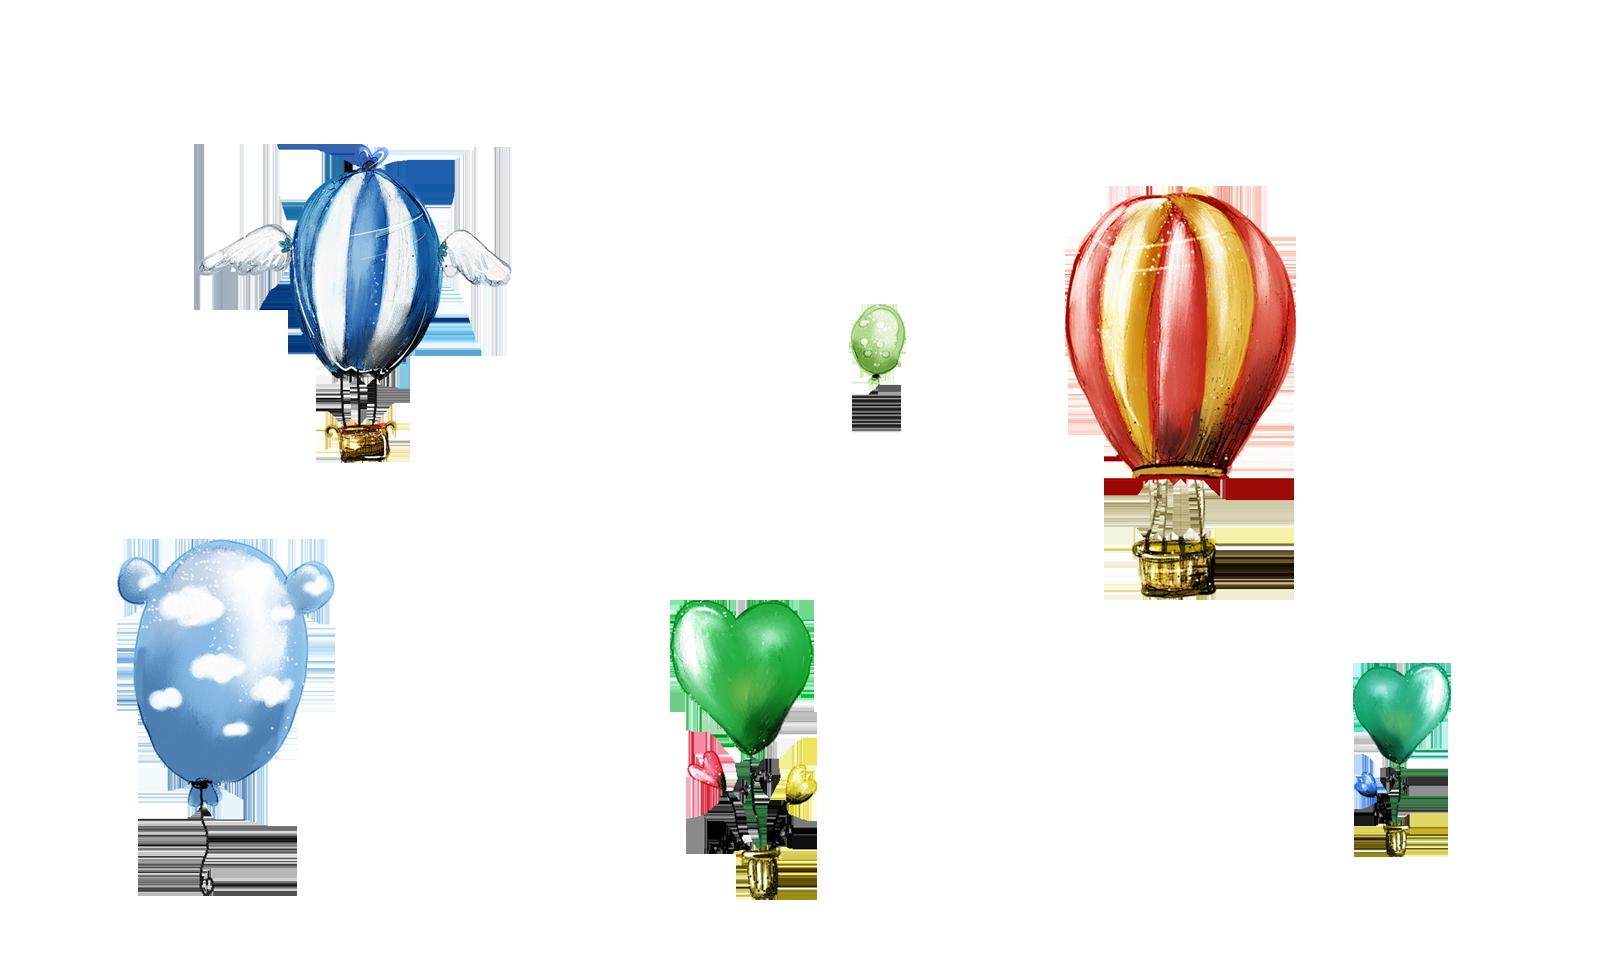 Mango clipart 1080p. Drawing hot air balloon